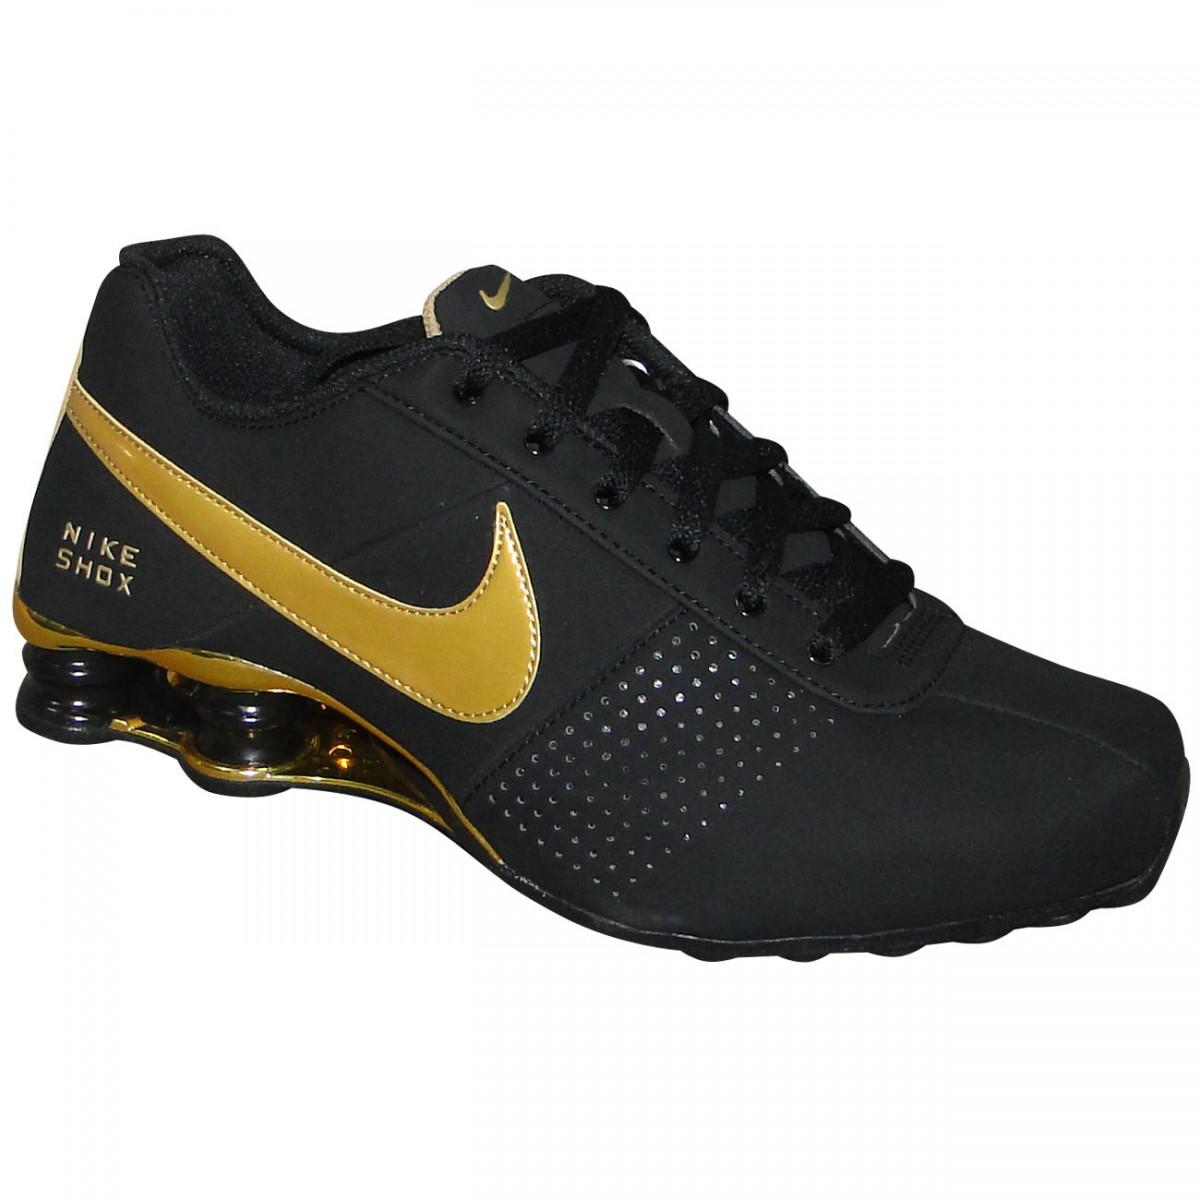 d5048ef0dfa Tenis Nike Shox Deliver 317547-036 - Preto Dourado - Chuteira Nike ...